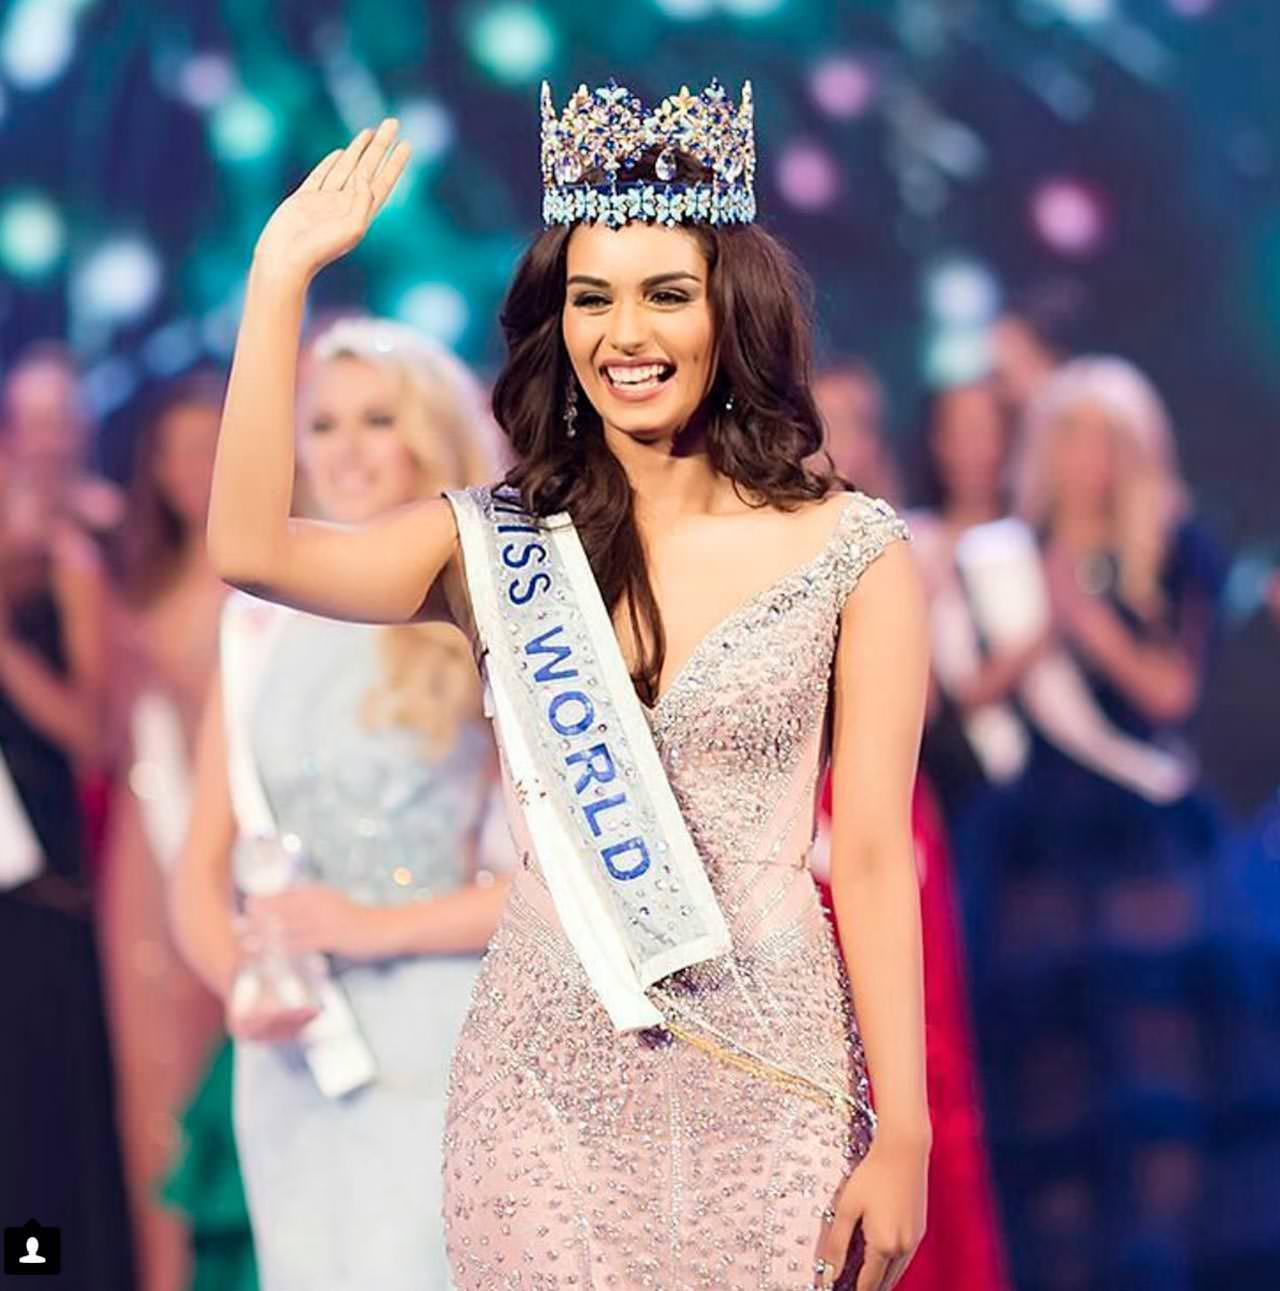 Фото | Мисс Мира 2017 года Мануши Чхиллар